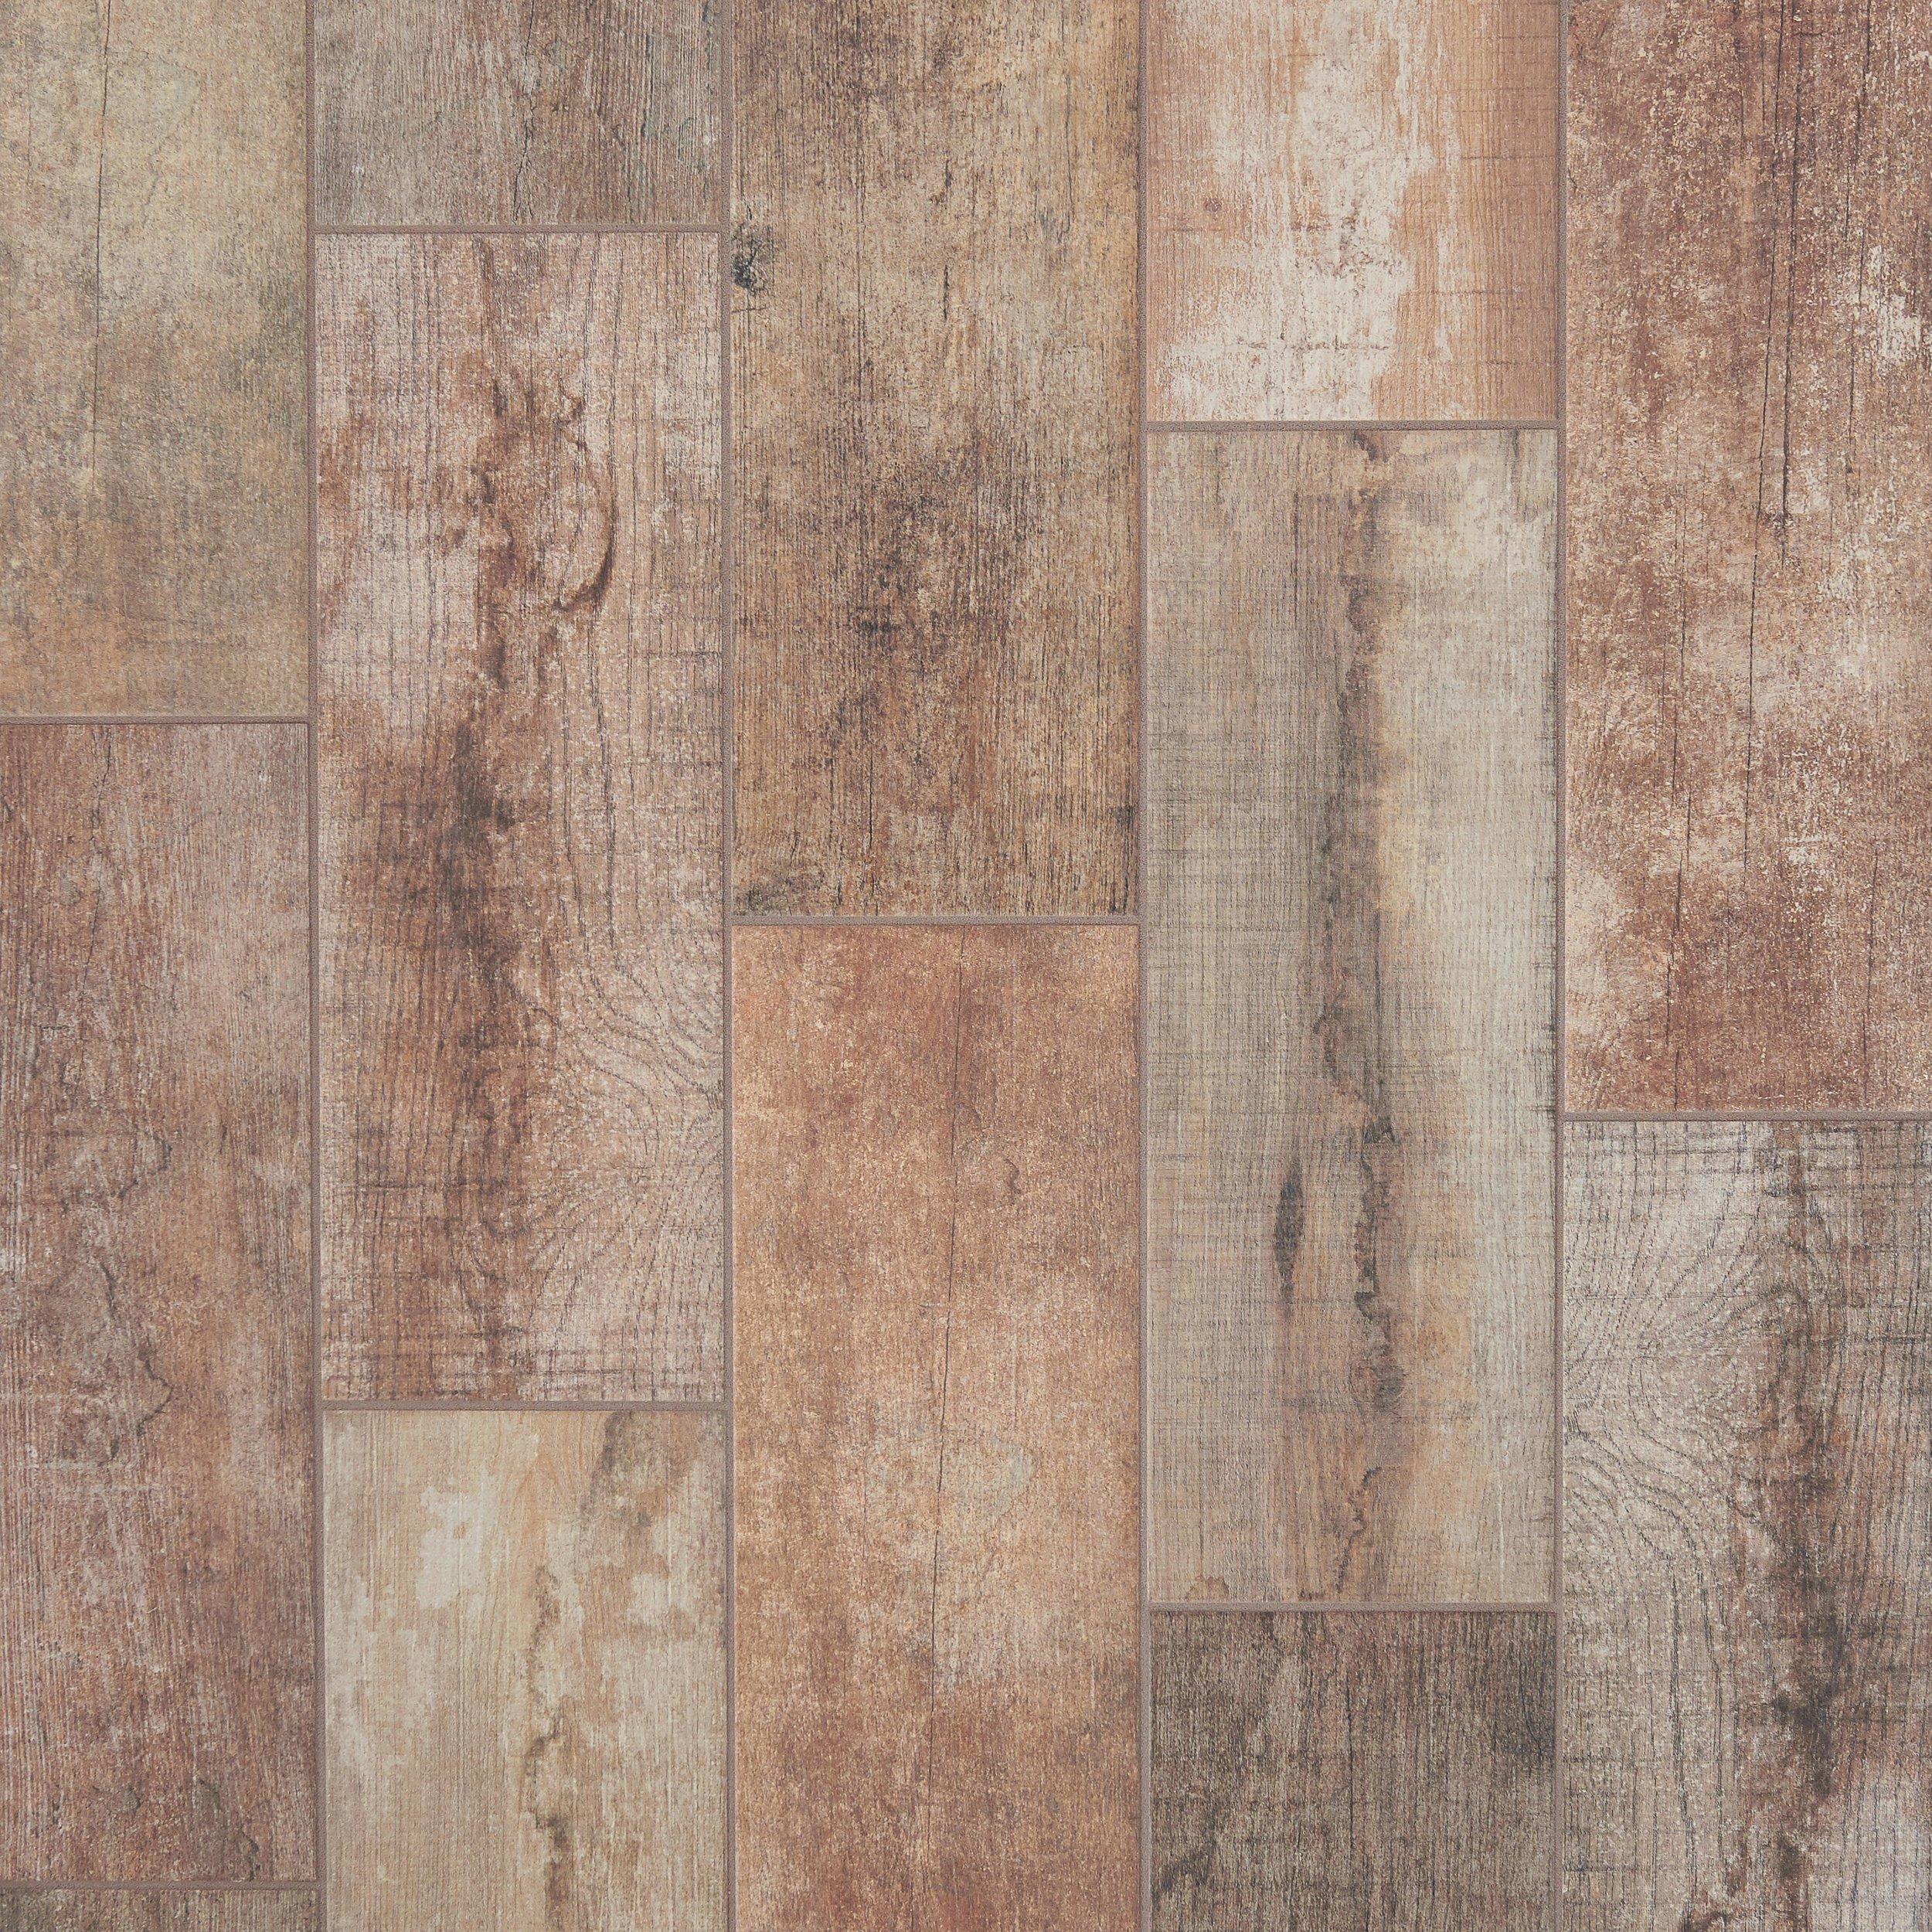 Porcelain Tile Wood Plank: Brunswick Oak Wood Plank Ceramic Tile